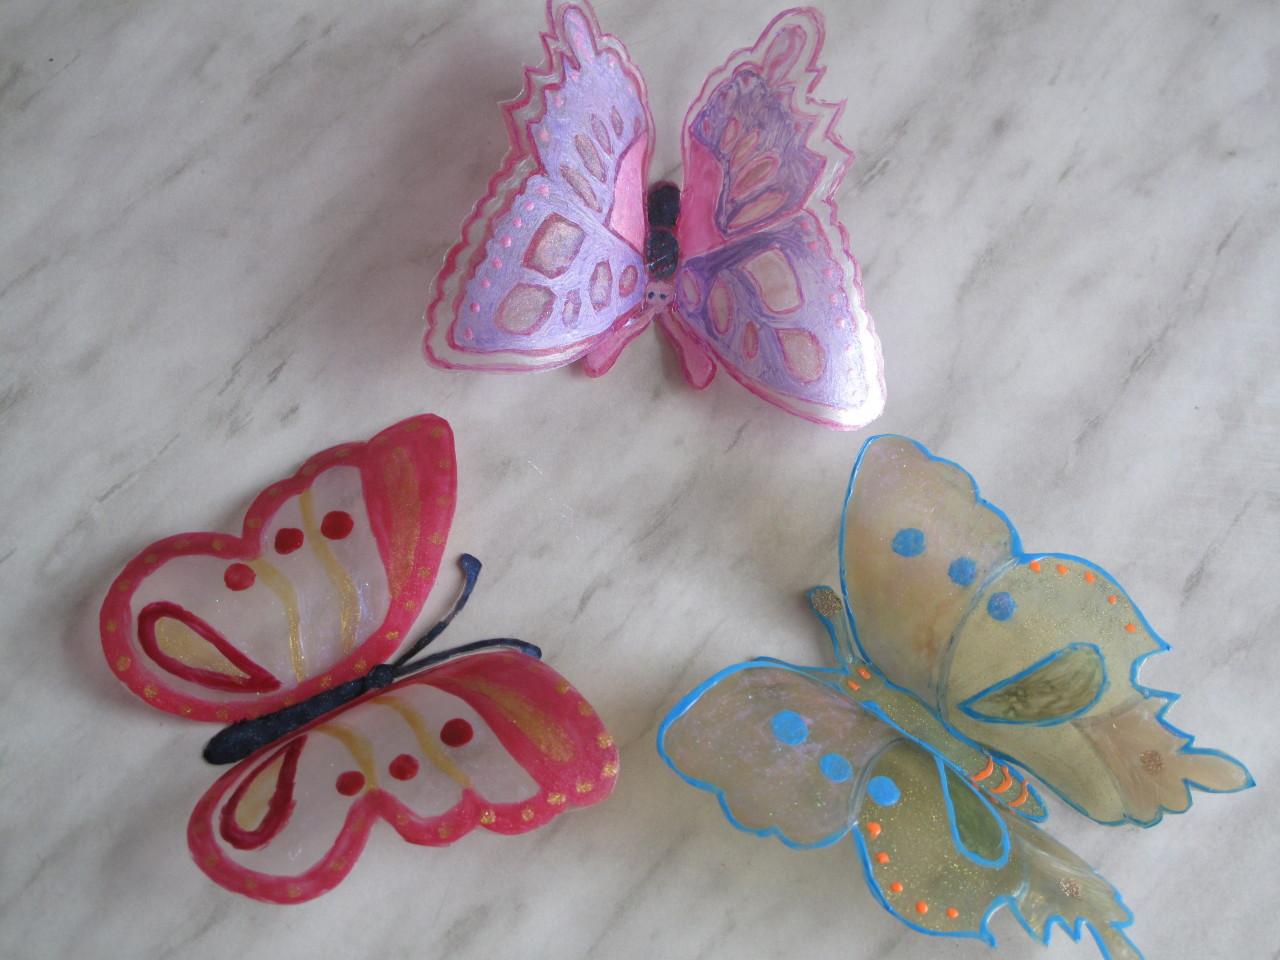 Бабочки из пластиковых бутылок мастер класс